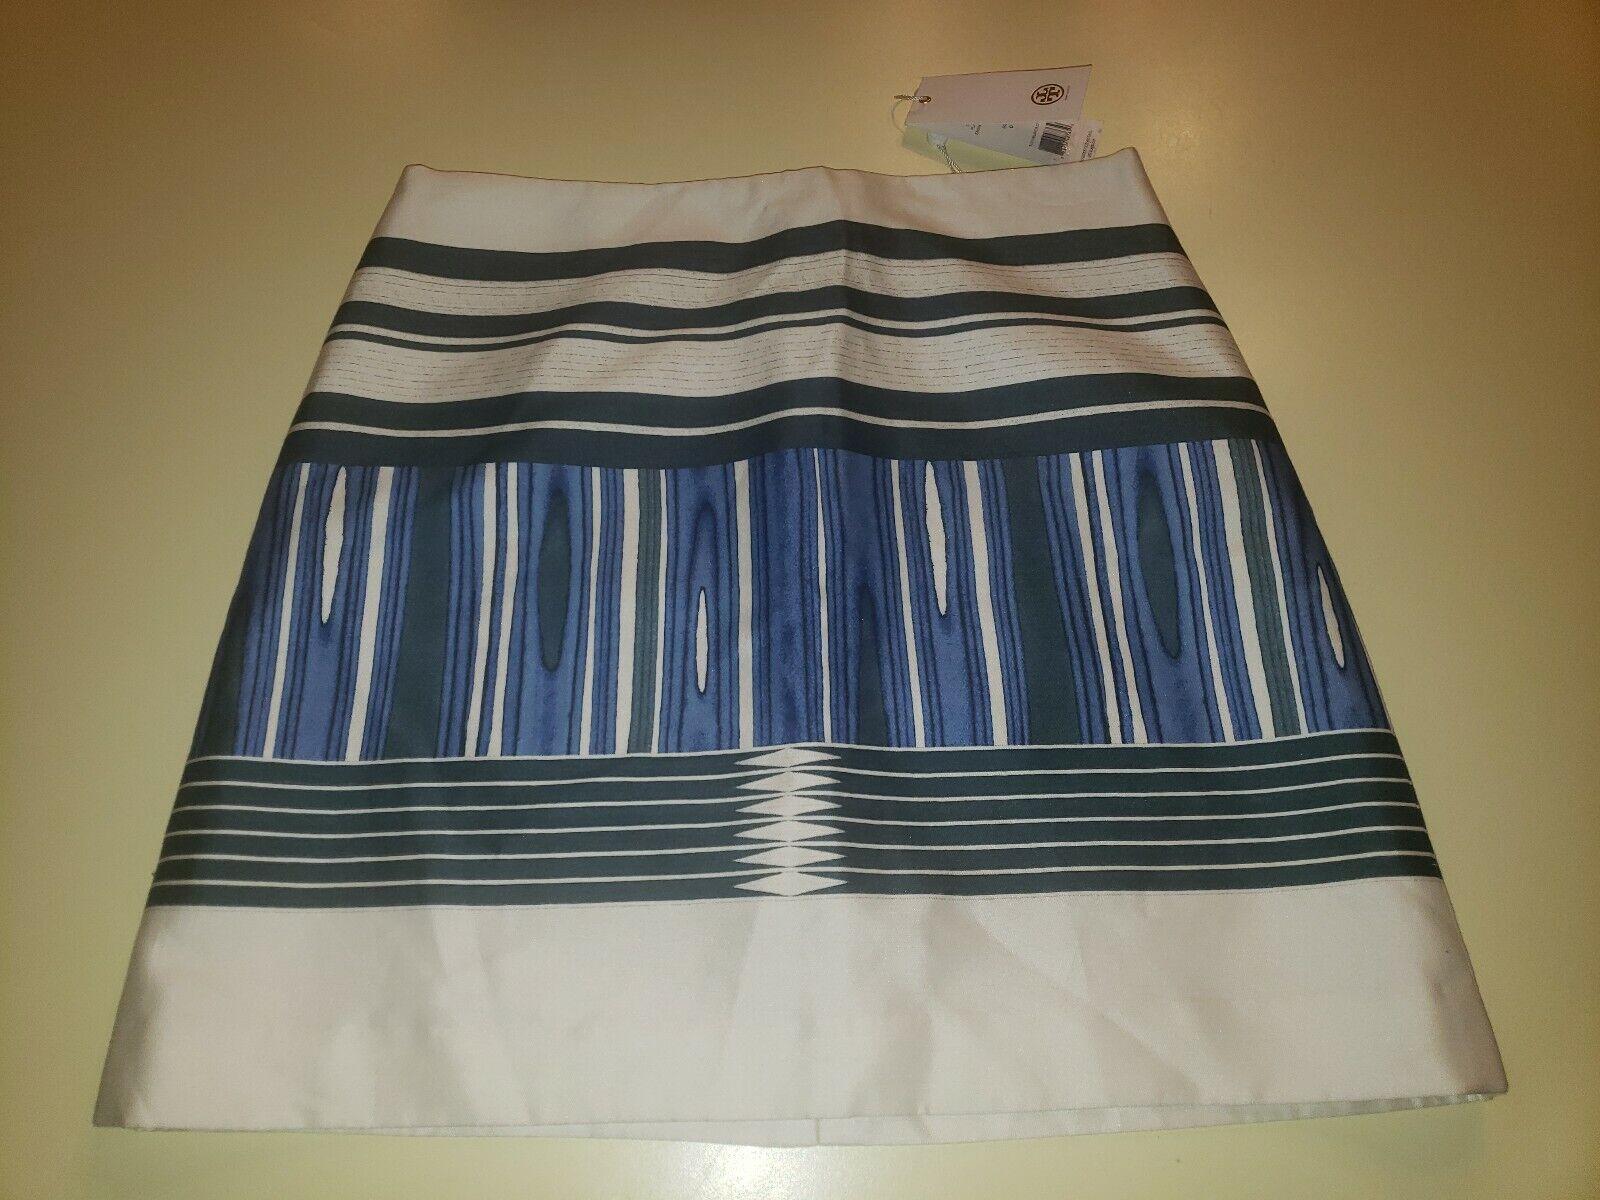 Tory Burch Plaited Stripe Engineerot Skirt Sz 0  395 NWT Ivory Blau 21151346